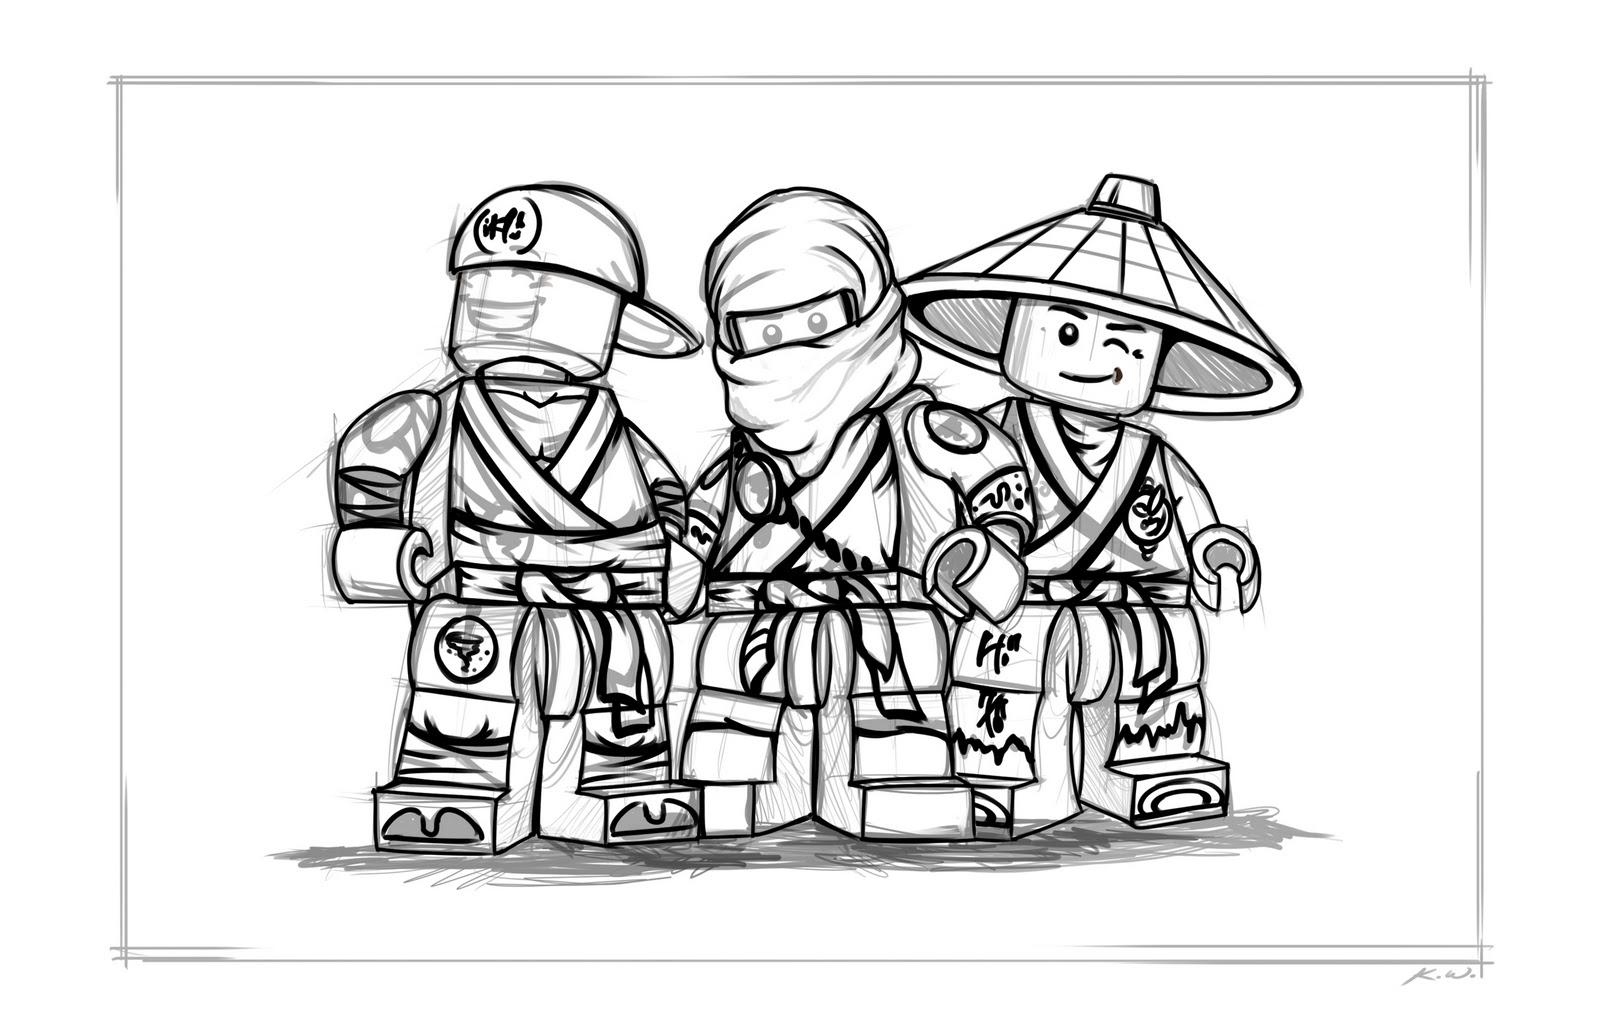 Category:Ninjago | LEGO Universe Wiki | FANDOM powered by ...